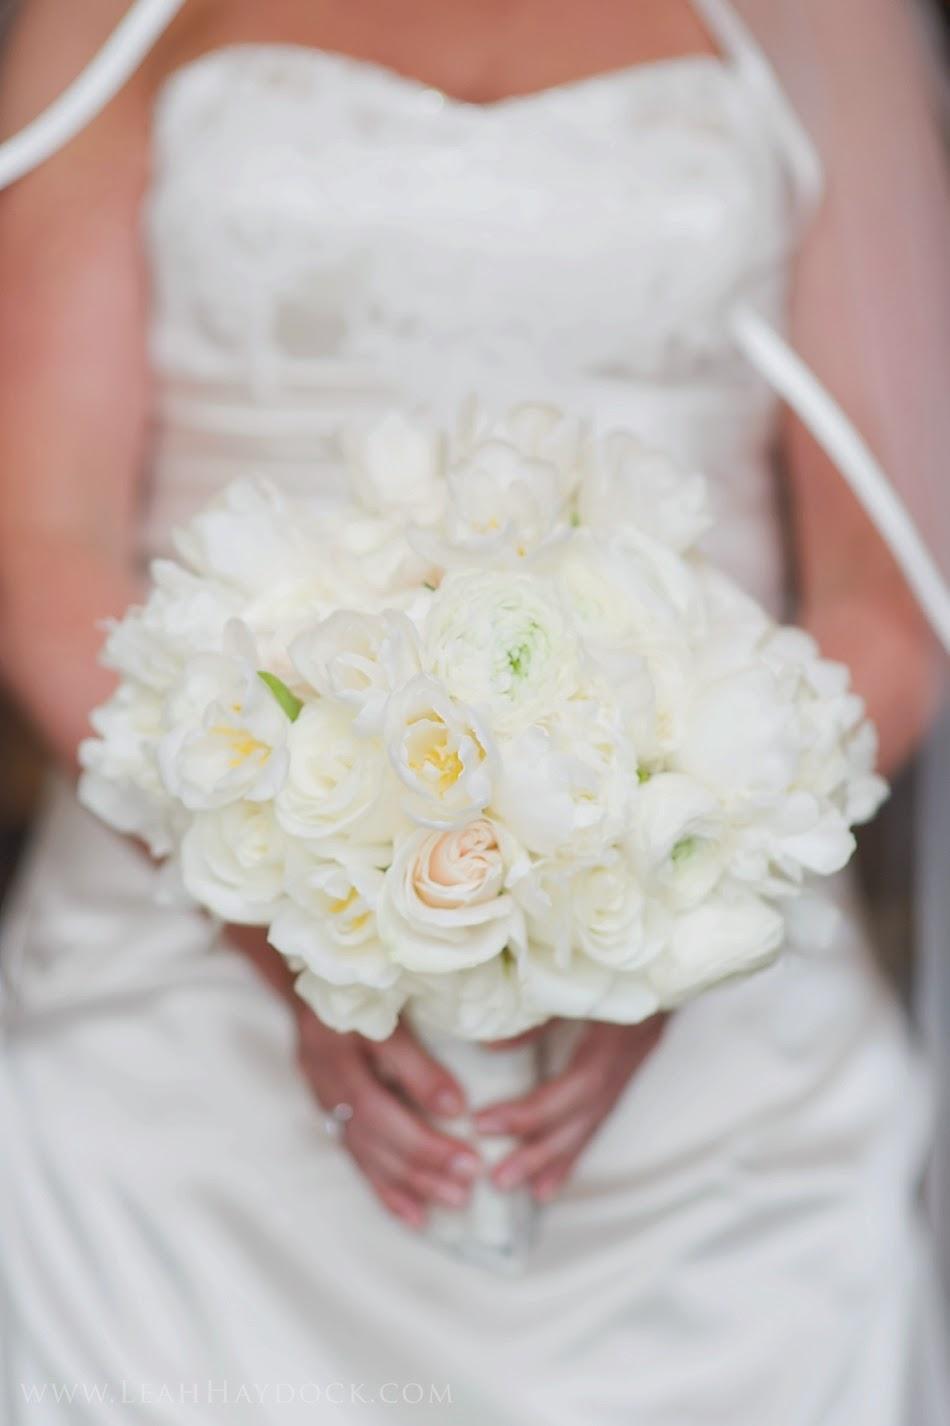 les fleurs : leah haydock photography : boston harbor hotel : winter wedding : white & black : white & ivory bridal bouquet